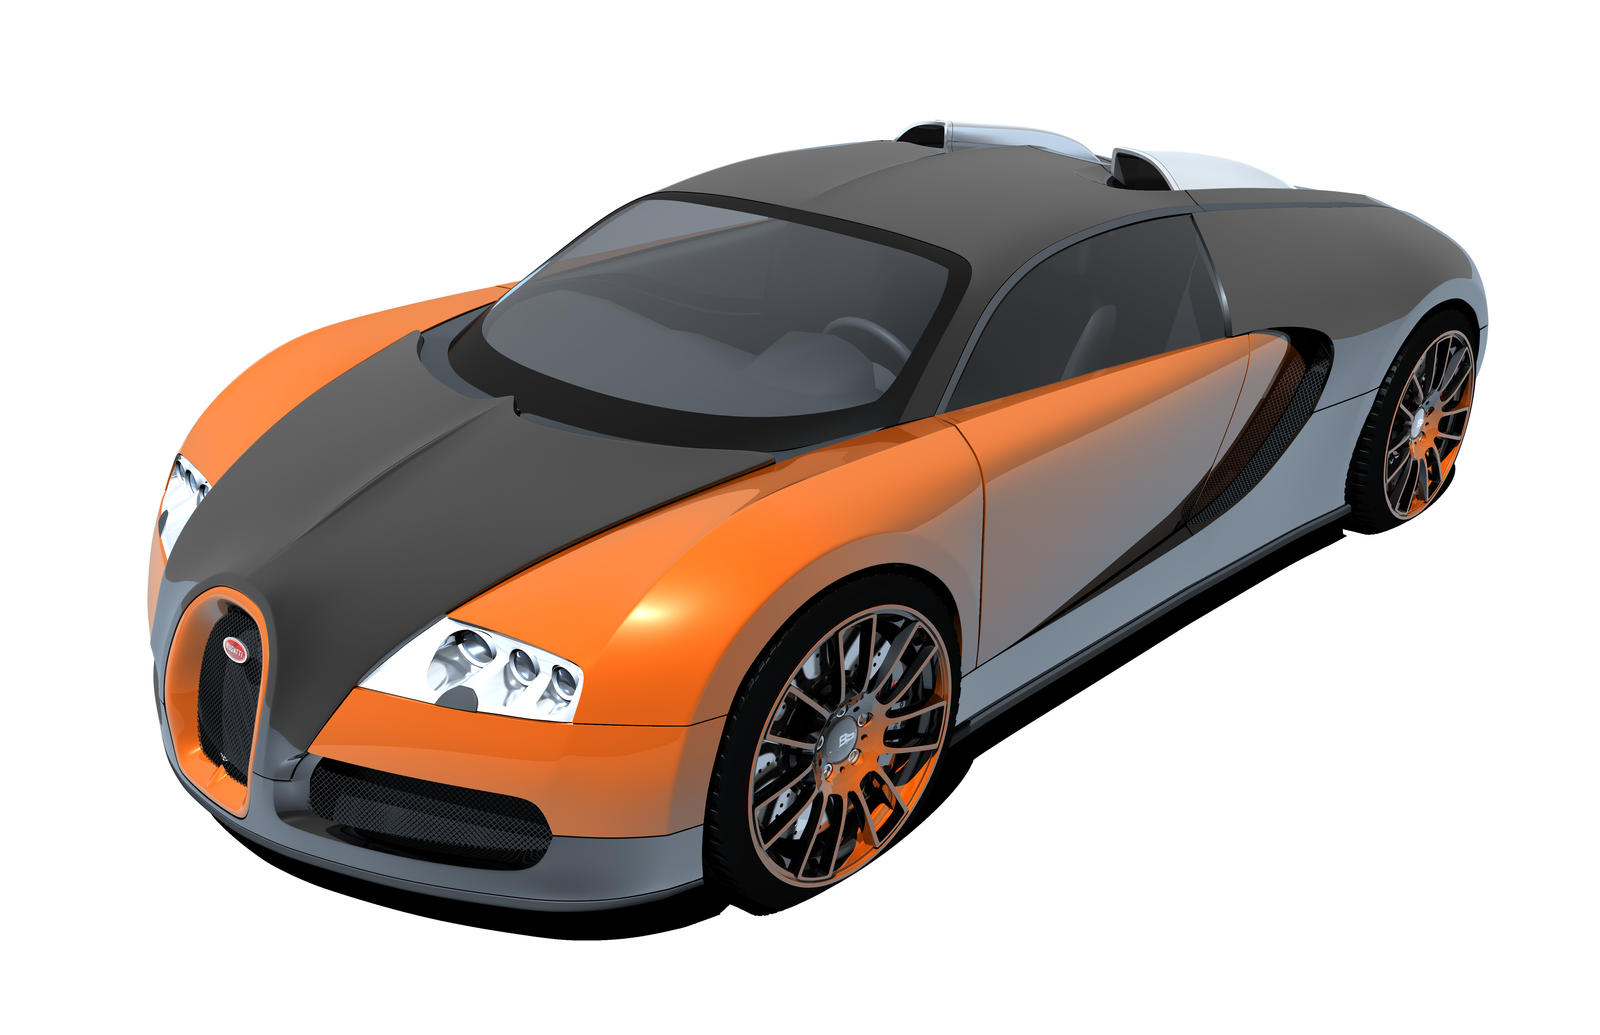 portfolio bugatti veyron front view by shadowcommander720 on deviantart. Black Bedroom Furniture Sets. Home Design Ideas